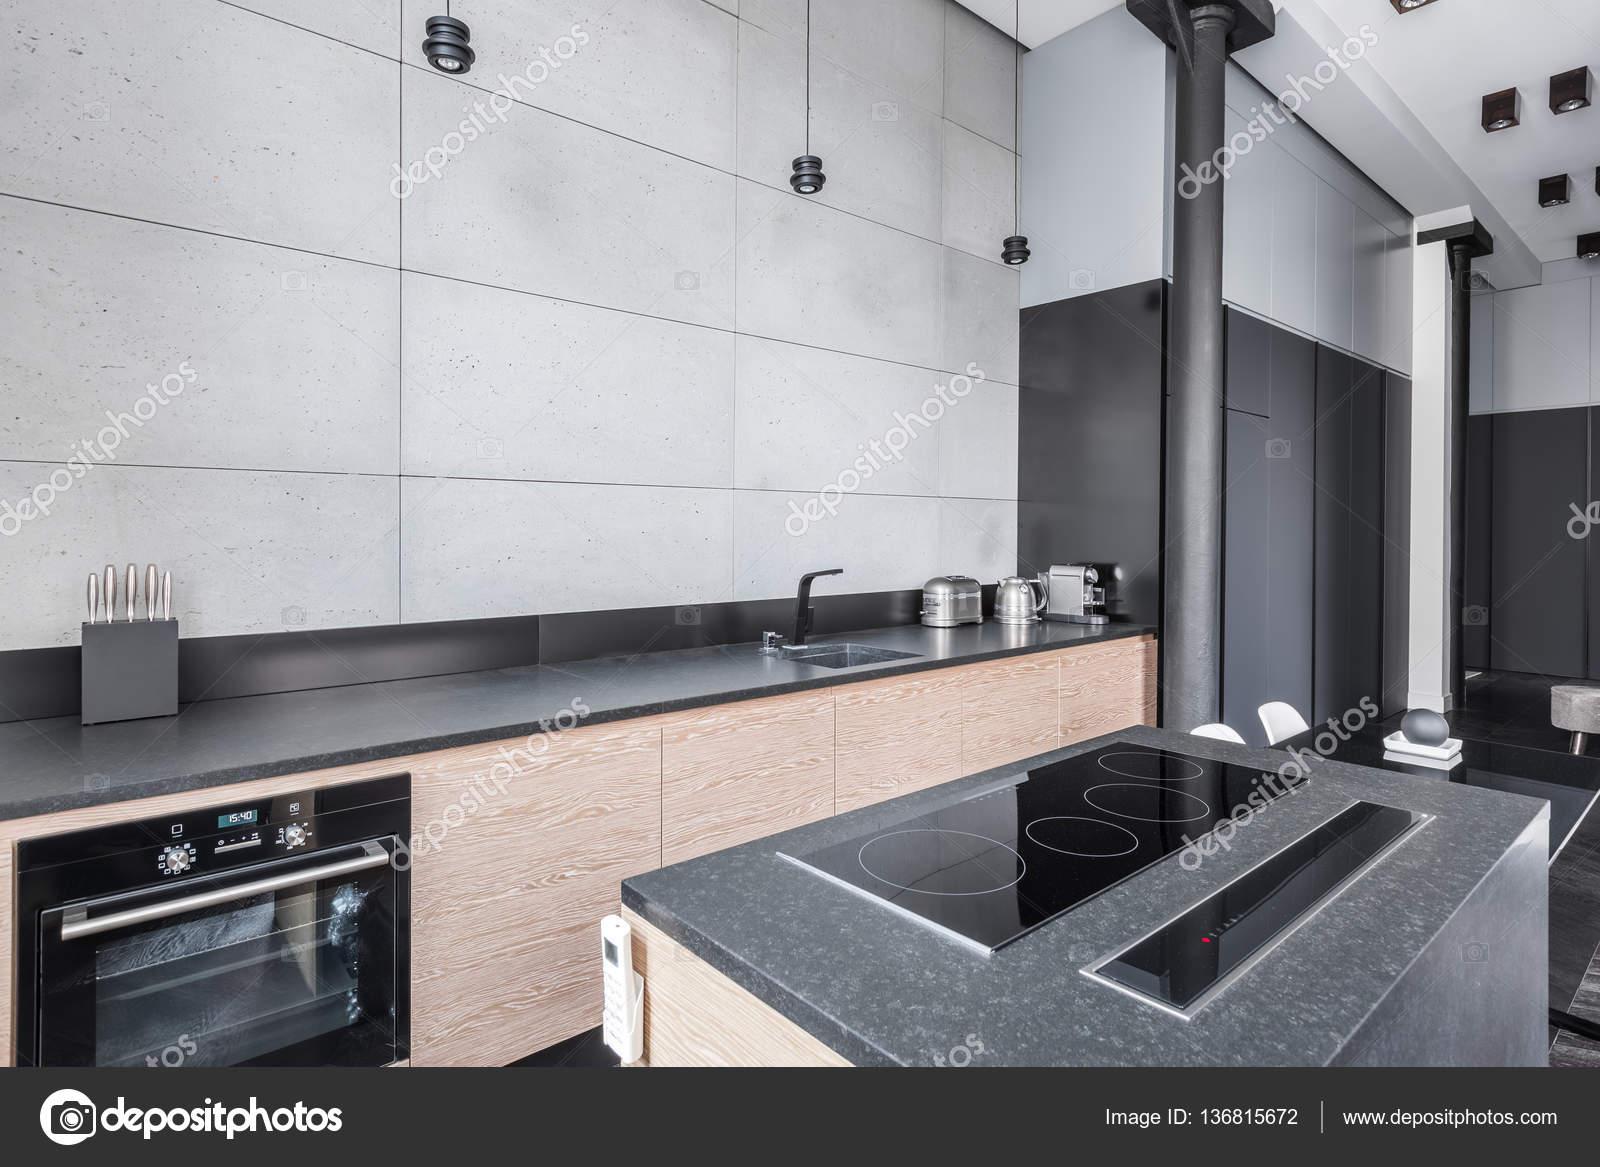 Cozinha Com Bancada Funcional Stock Photo In4mal 136815672